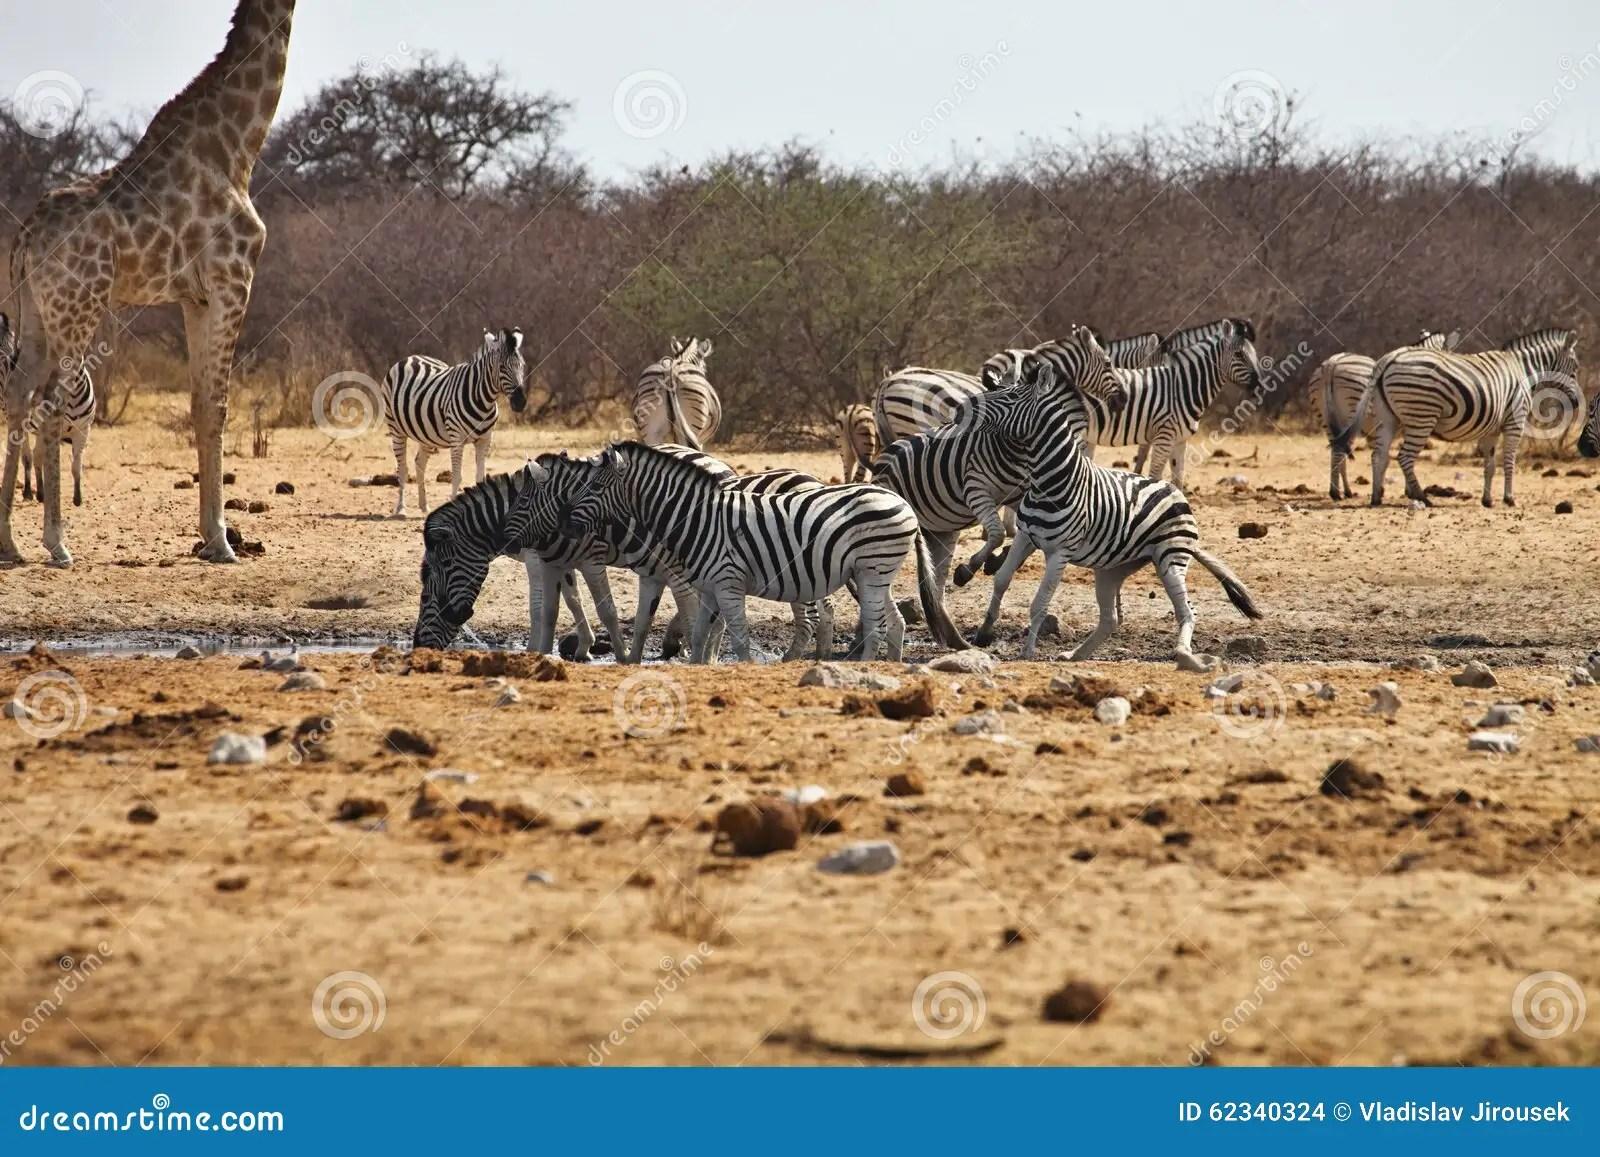 Fighting Males Damara Zebras And Giraffes At The Waterhole